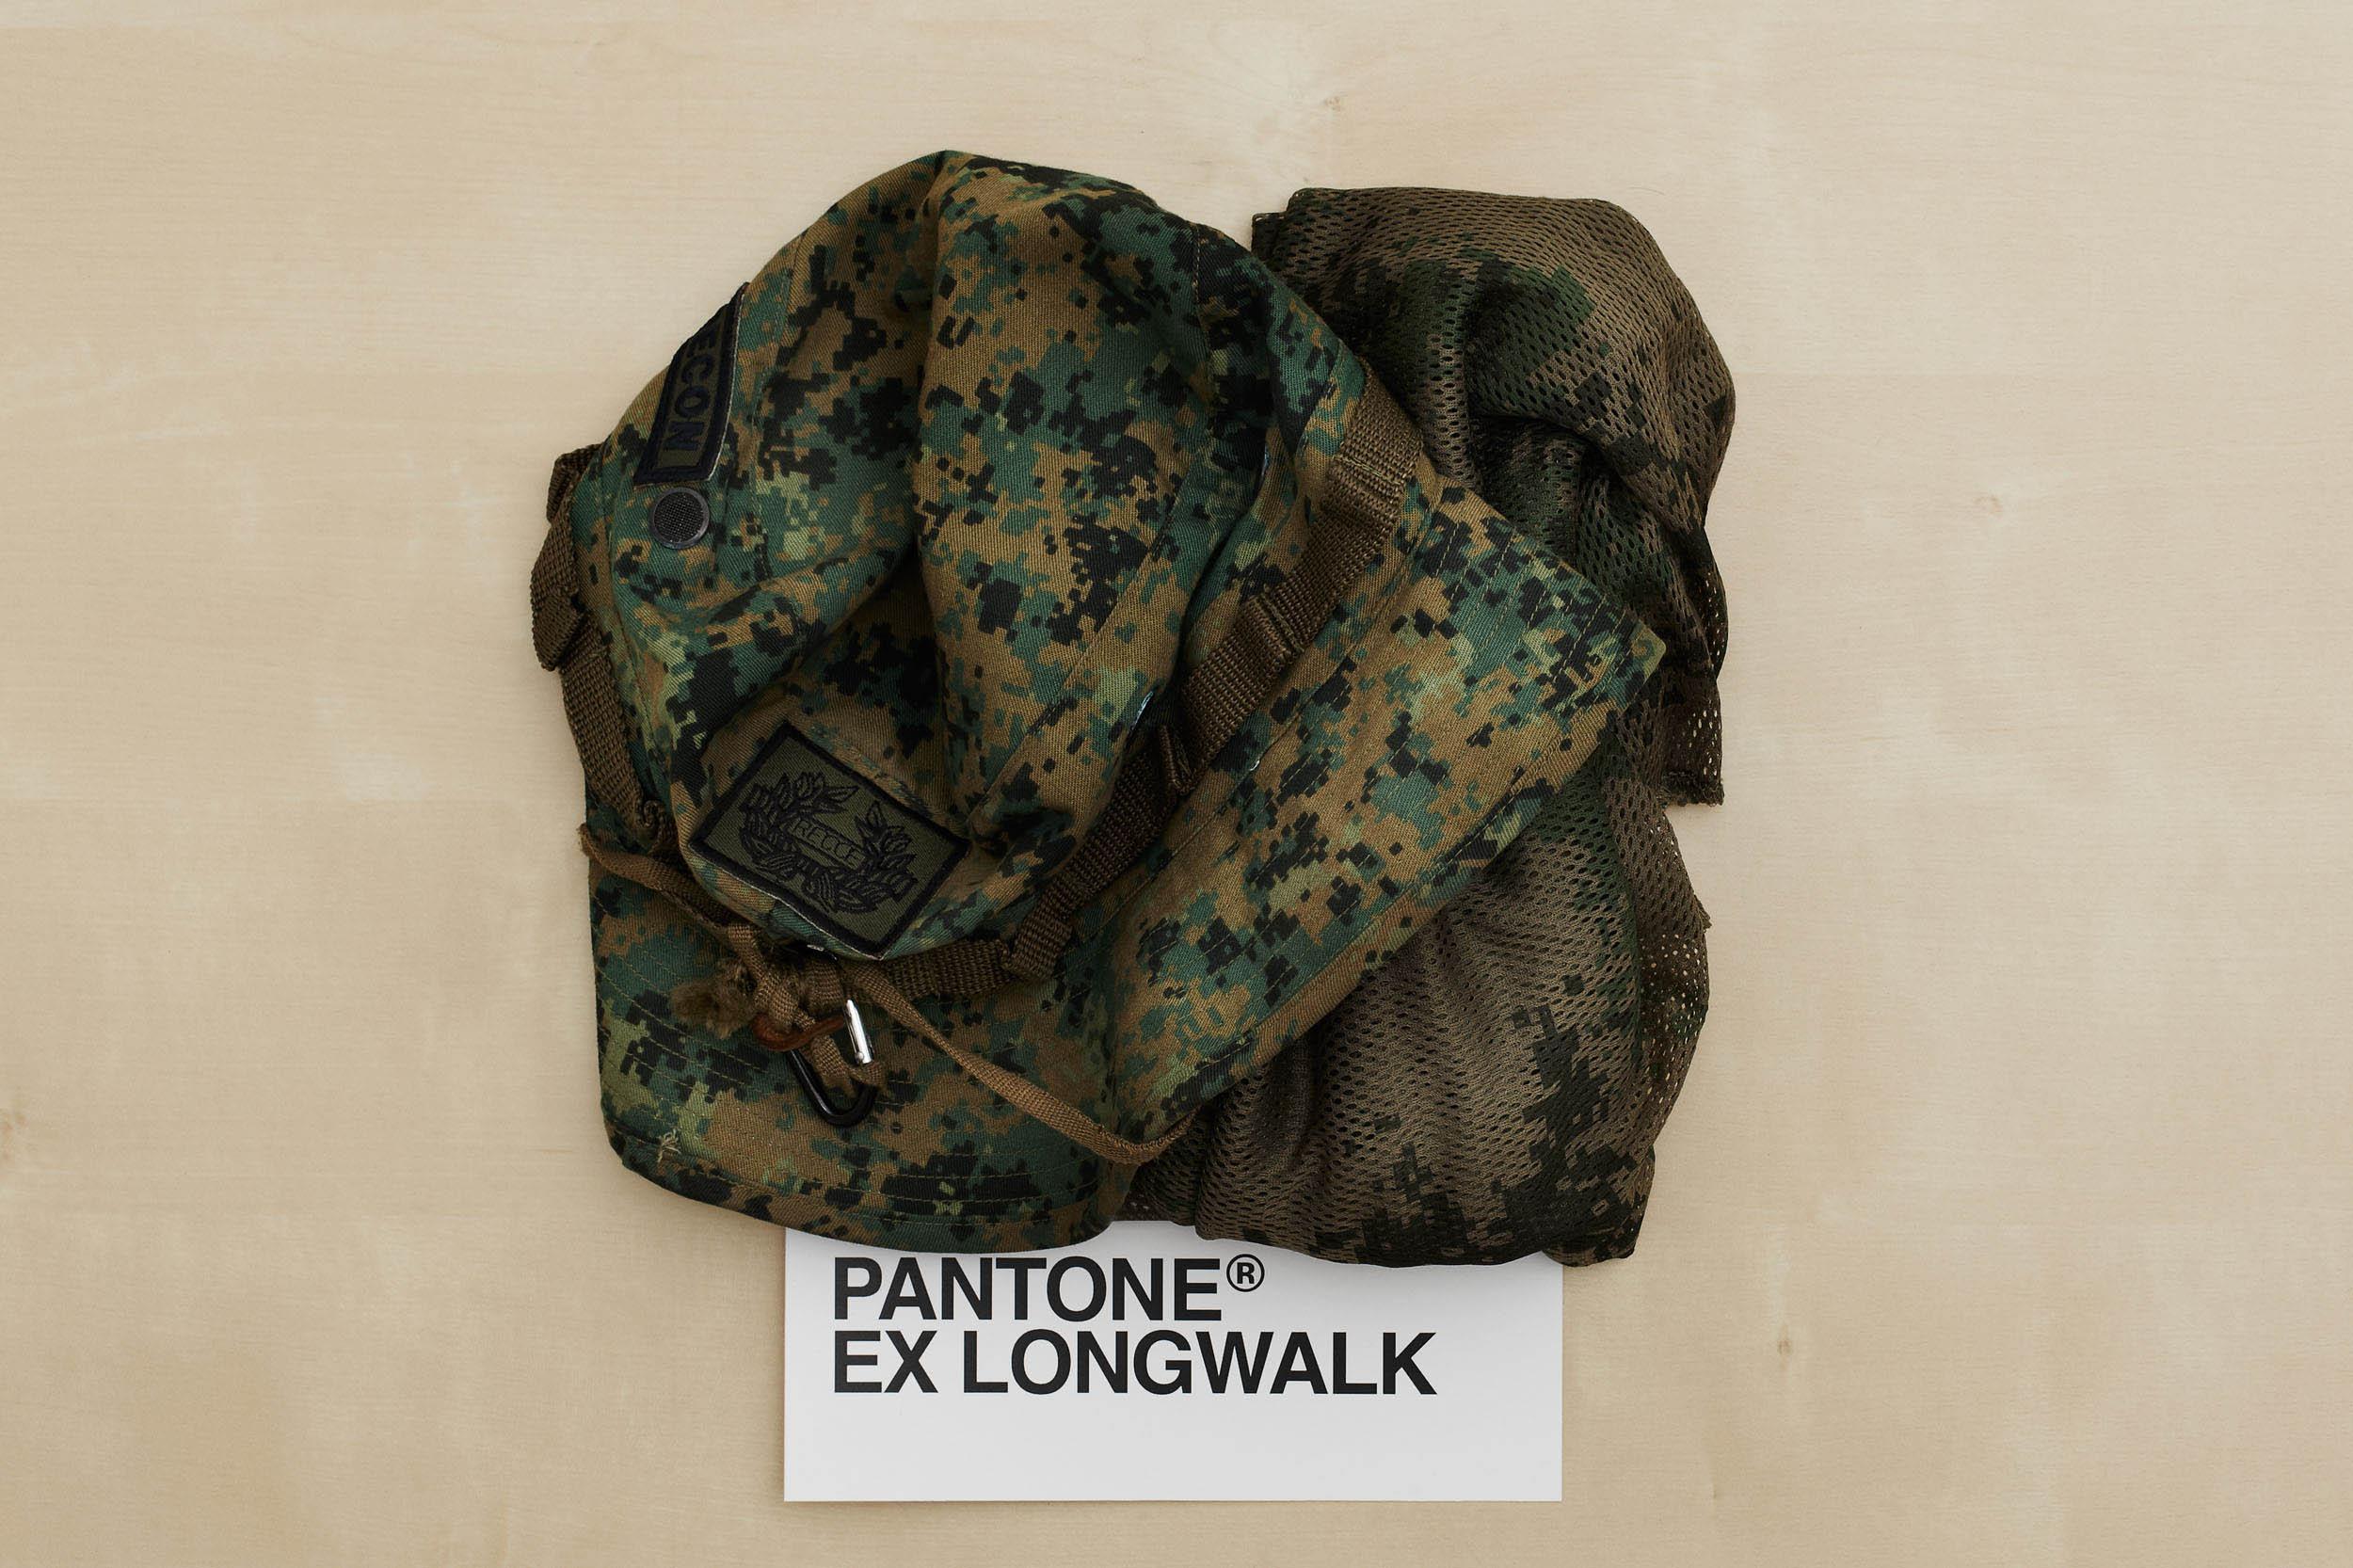 PantoneExLongwalk.jpg